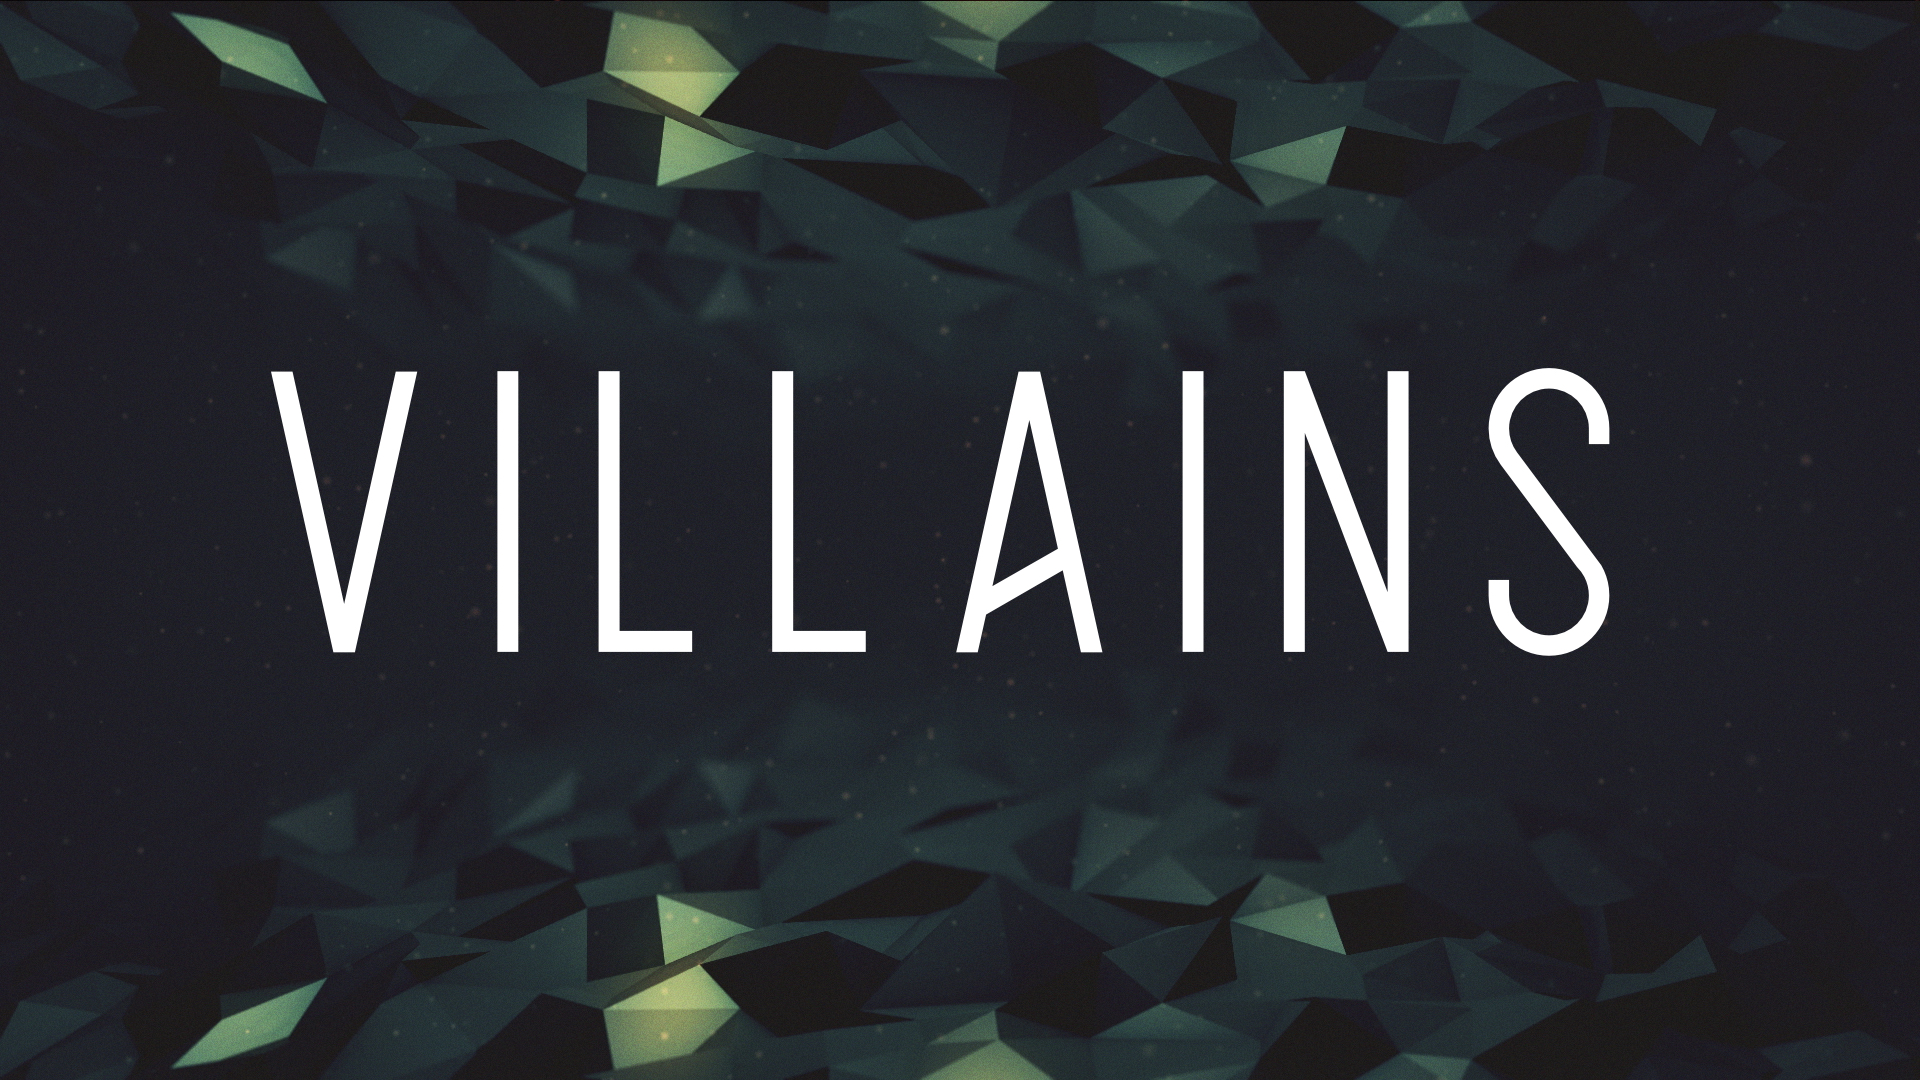 2019.06.16_VillainsTitleSlide.001.jpeg